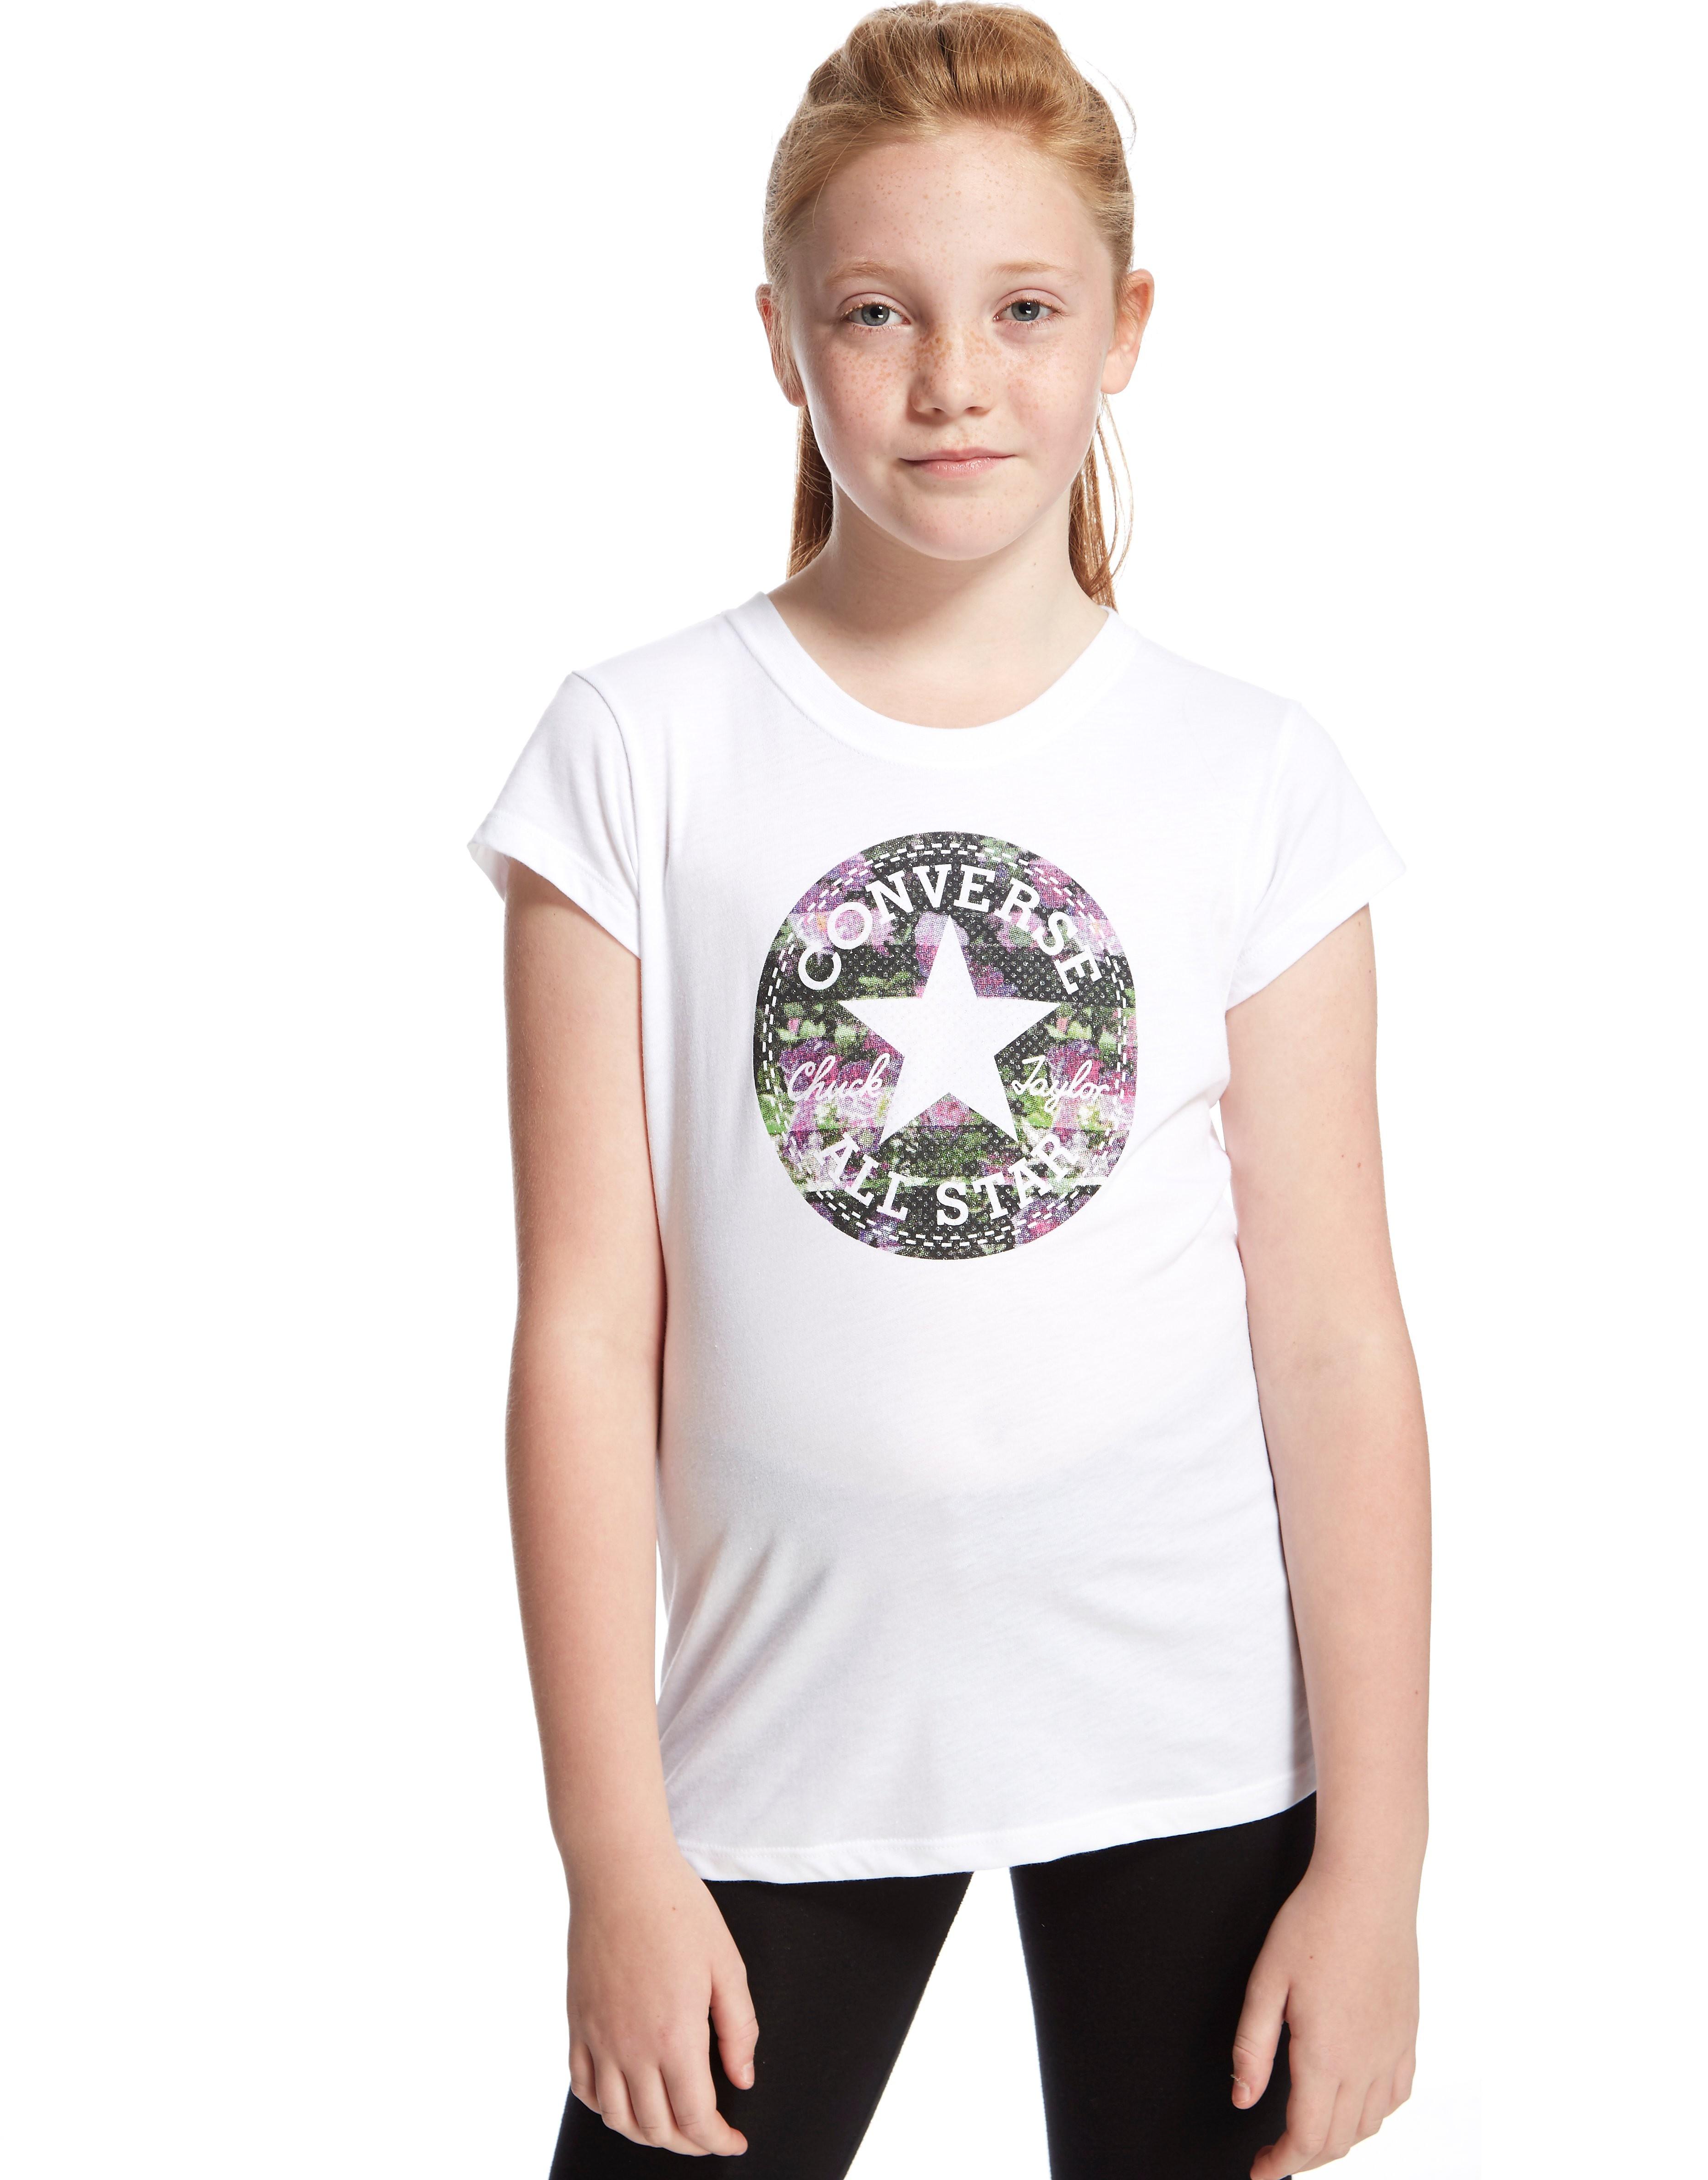 Converse Chuck Rose T-Shirt Junior - White/Purple - Kids, White/Purple